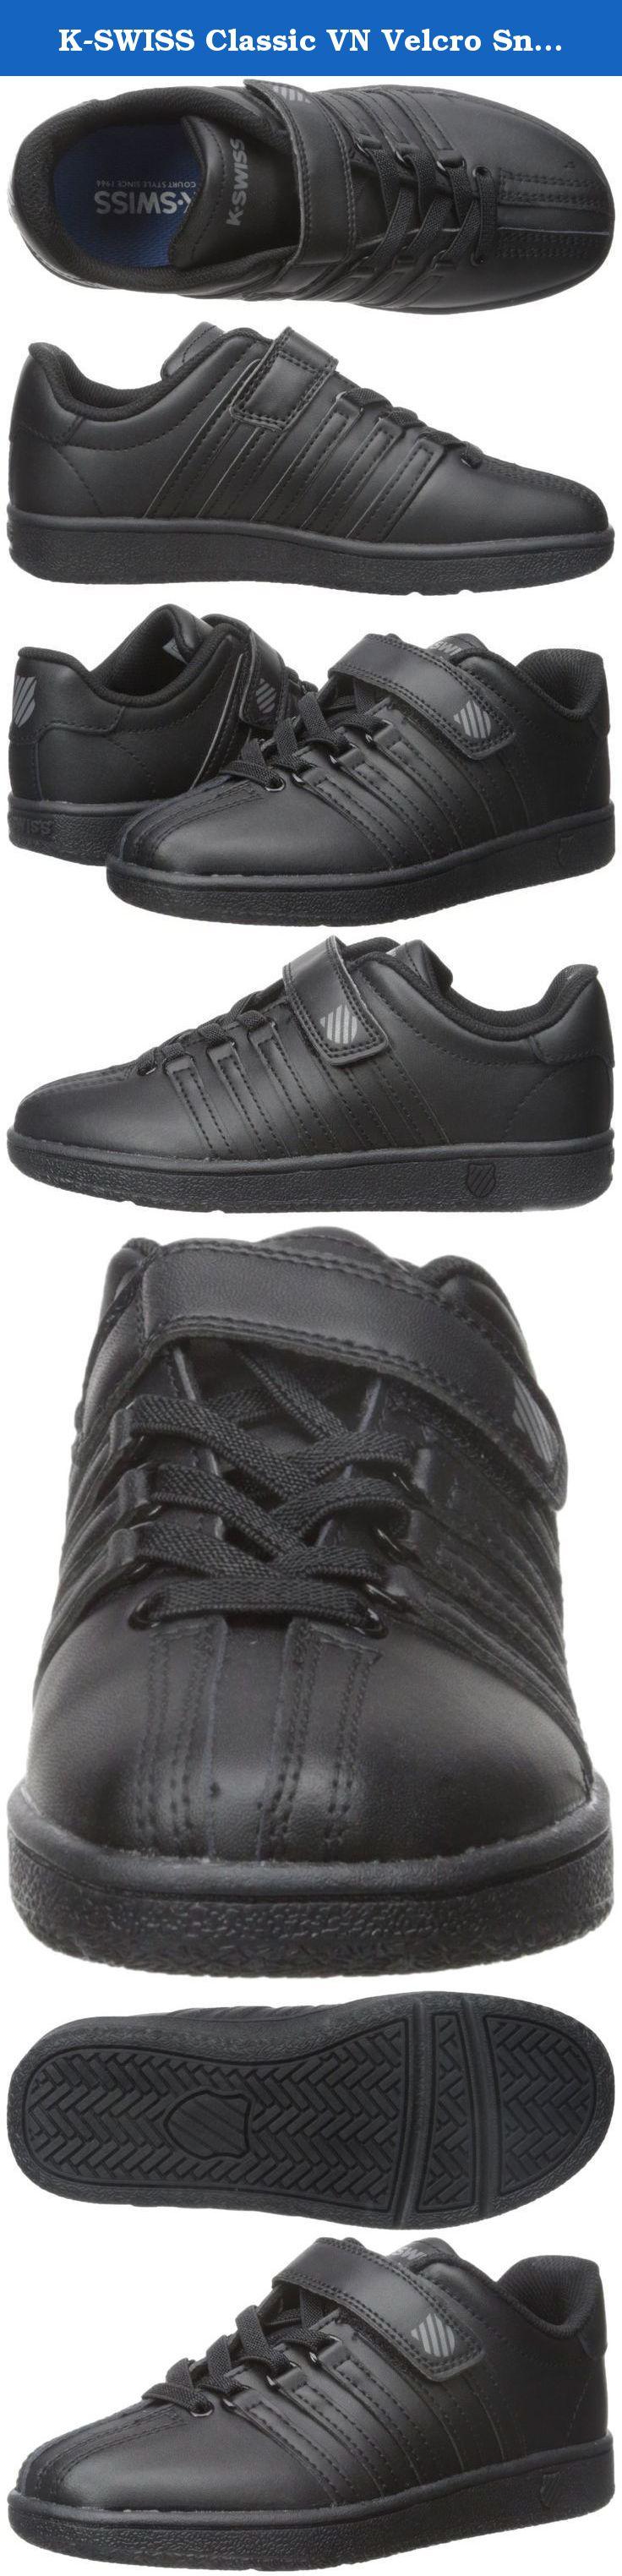 K-SWISS Classic VN Velcro Sneaker